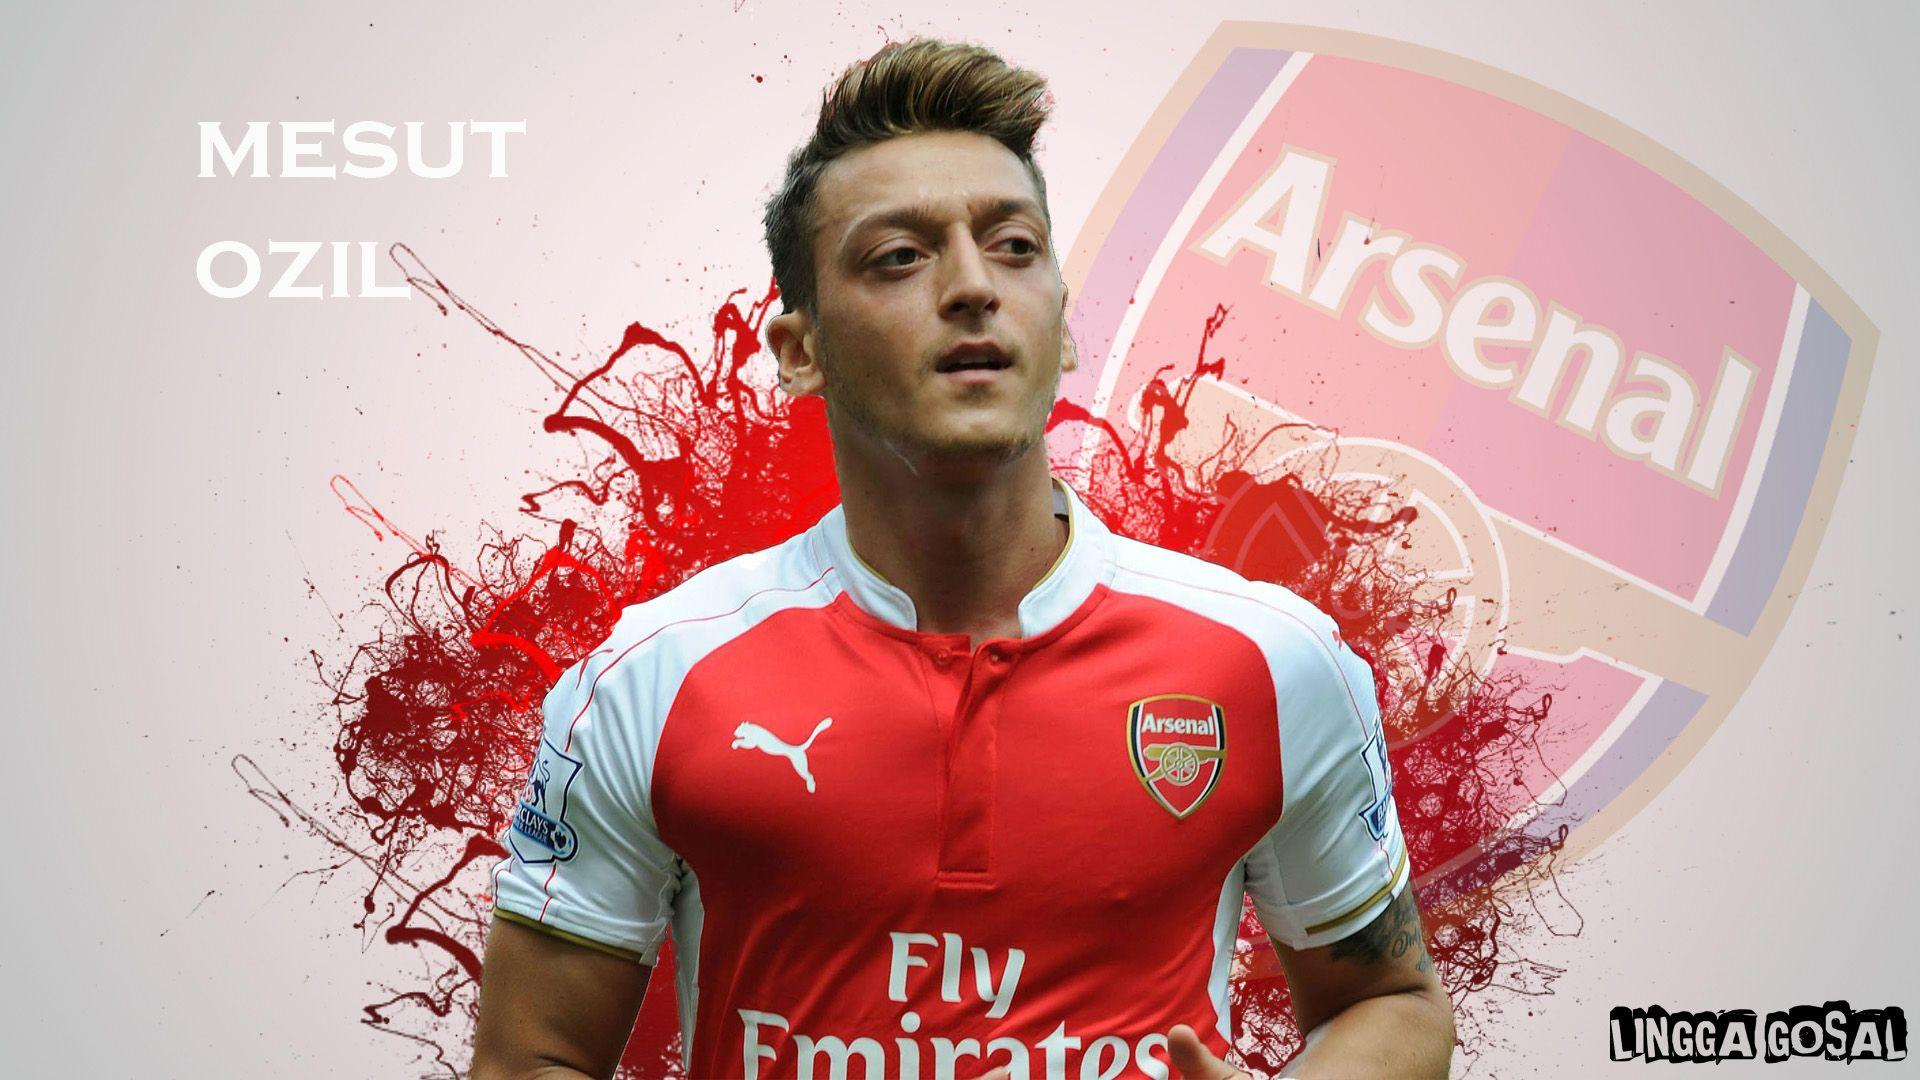 Mesut Özil Wallpaper Hd